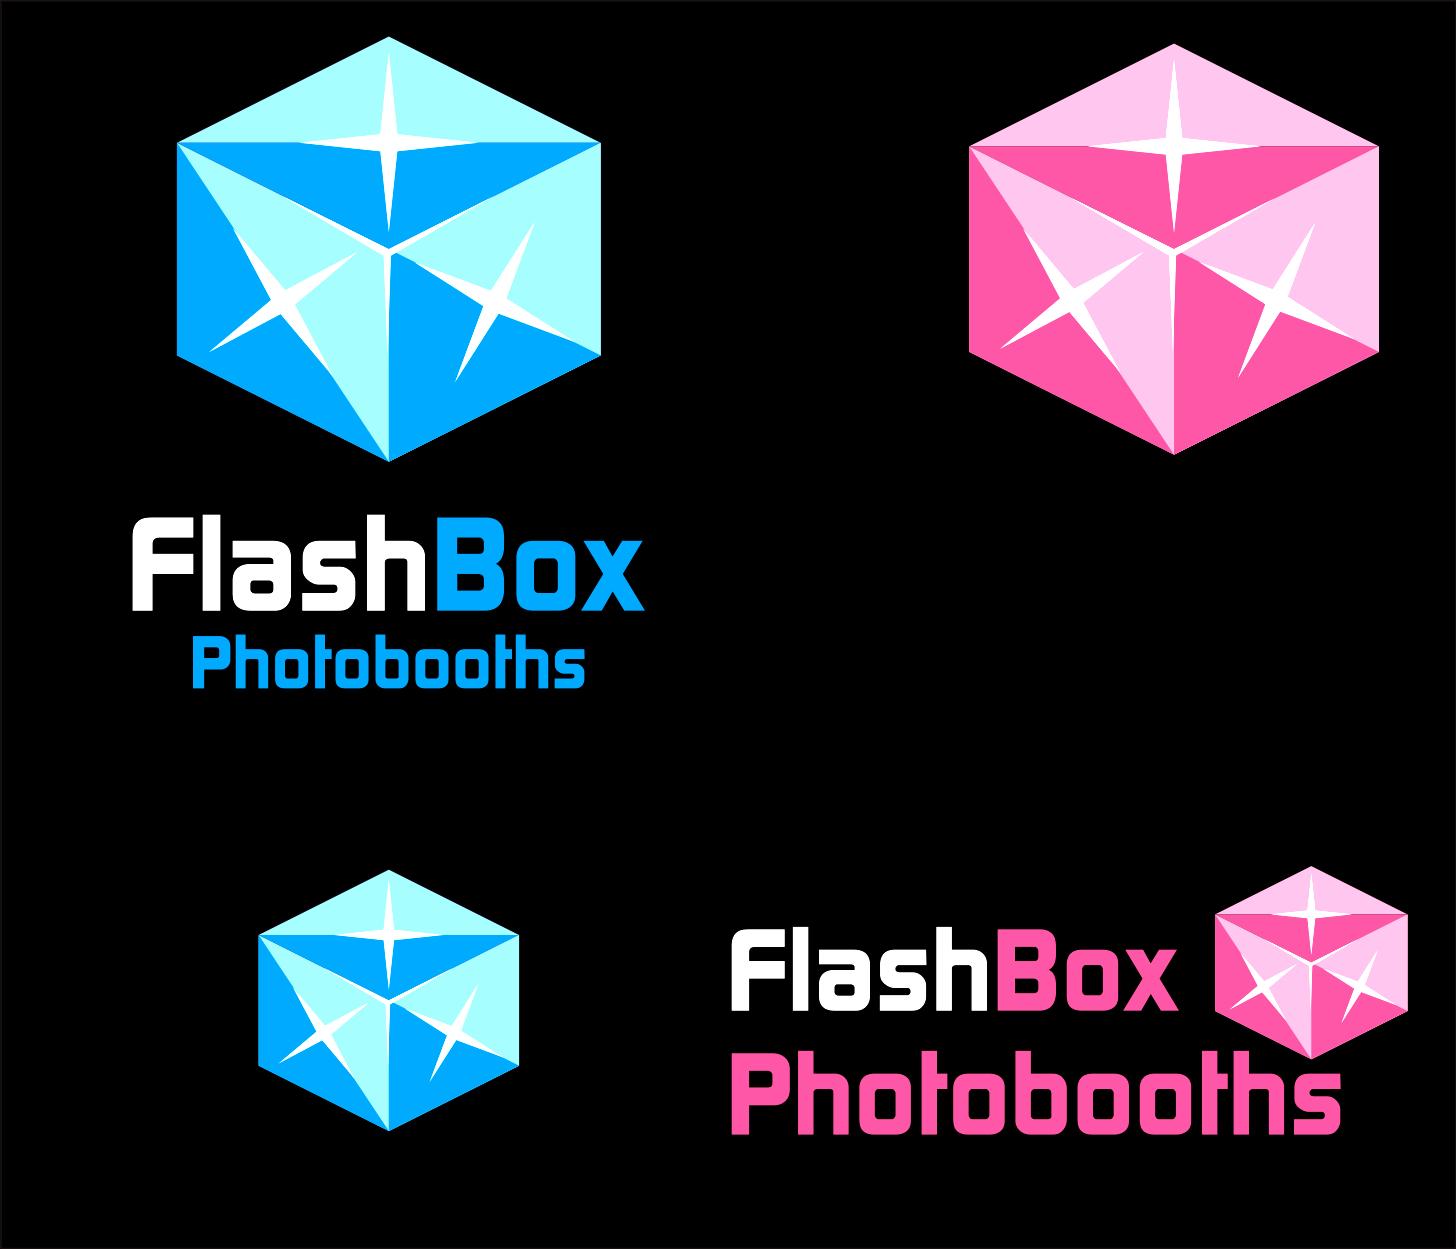 Logo Design by Armada Jamaluddin - Entry No. 90 in the Logo Design Contest New Logo Design for FlashBox Photobooths.